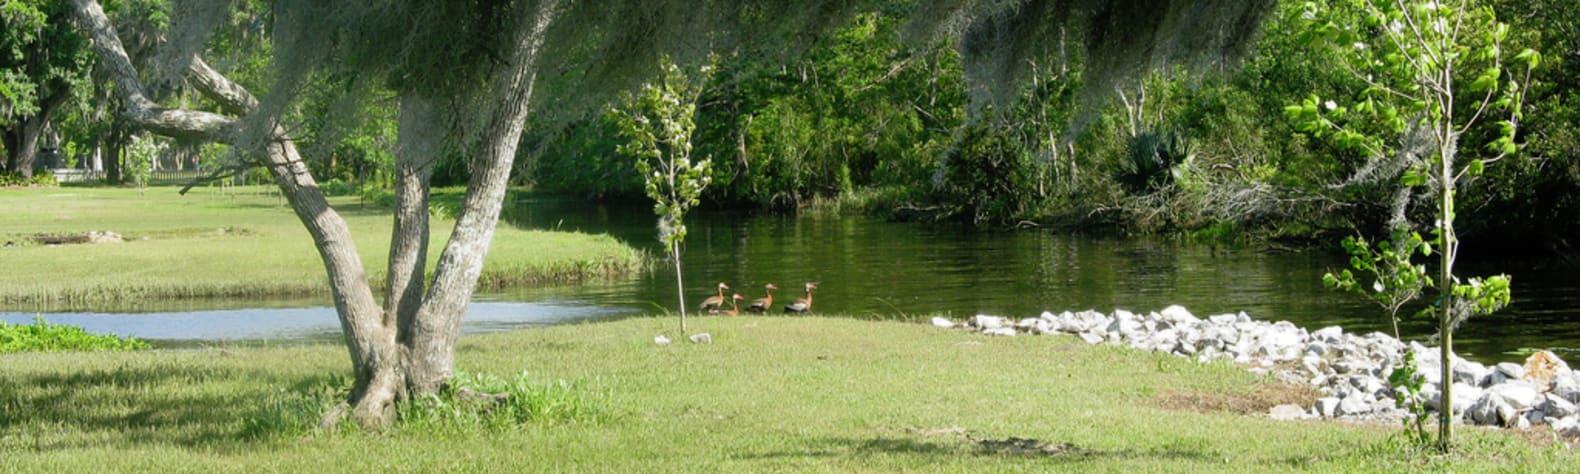 Fairview Riverside State Park